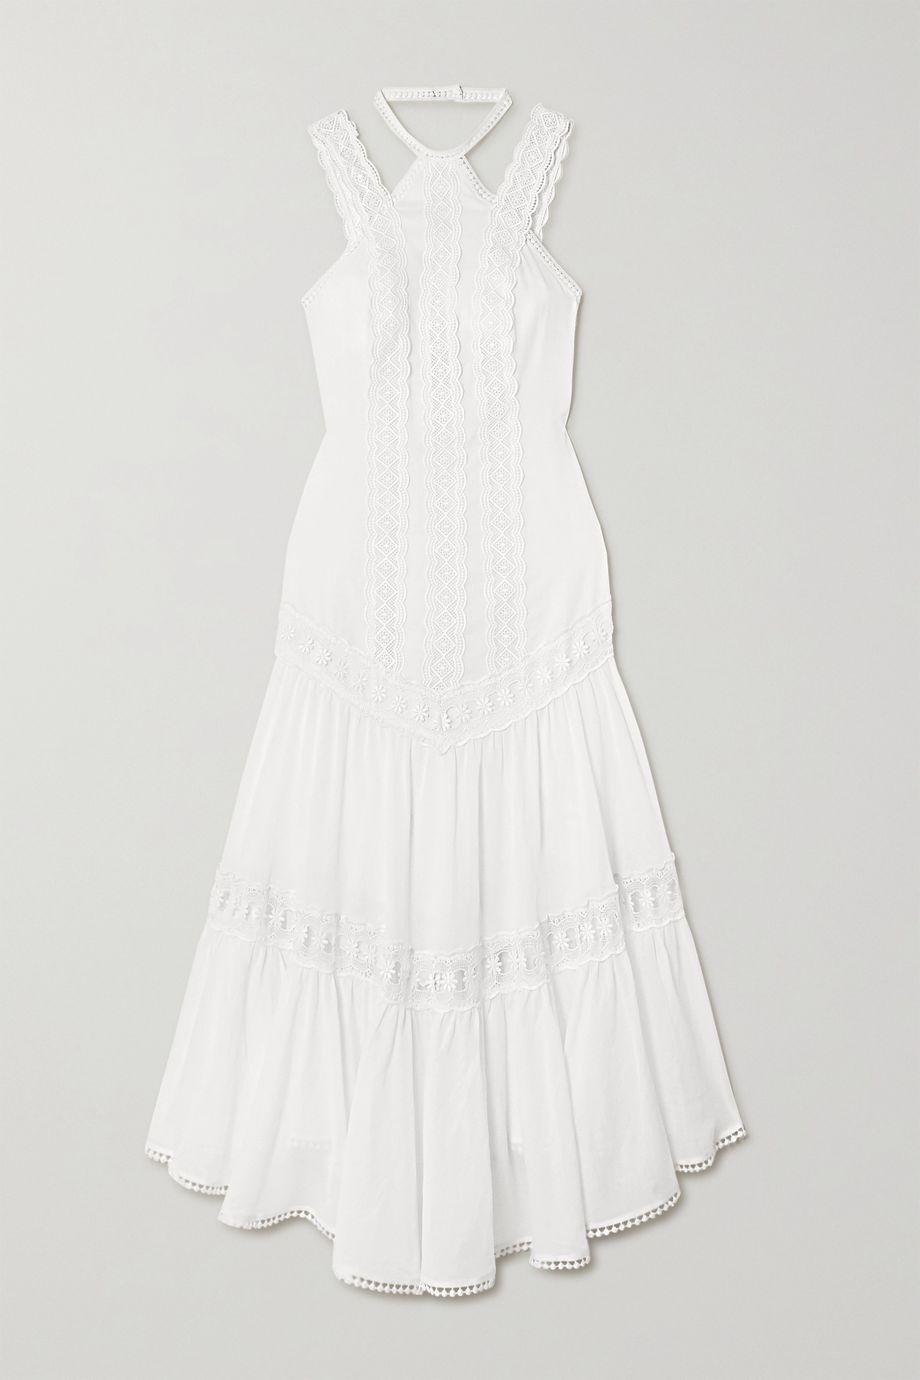 Charo Ruiz Analia crocheted lace-trimmed cotton-blend voile midi dress